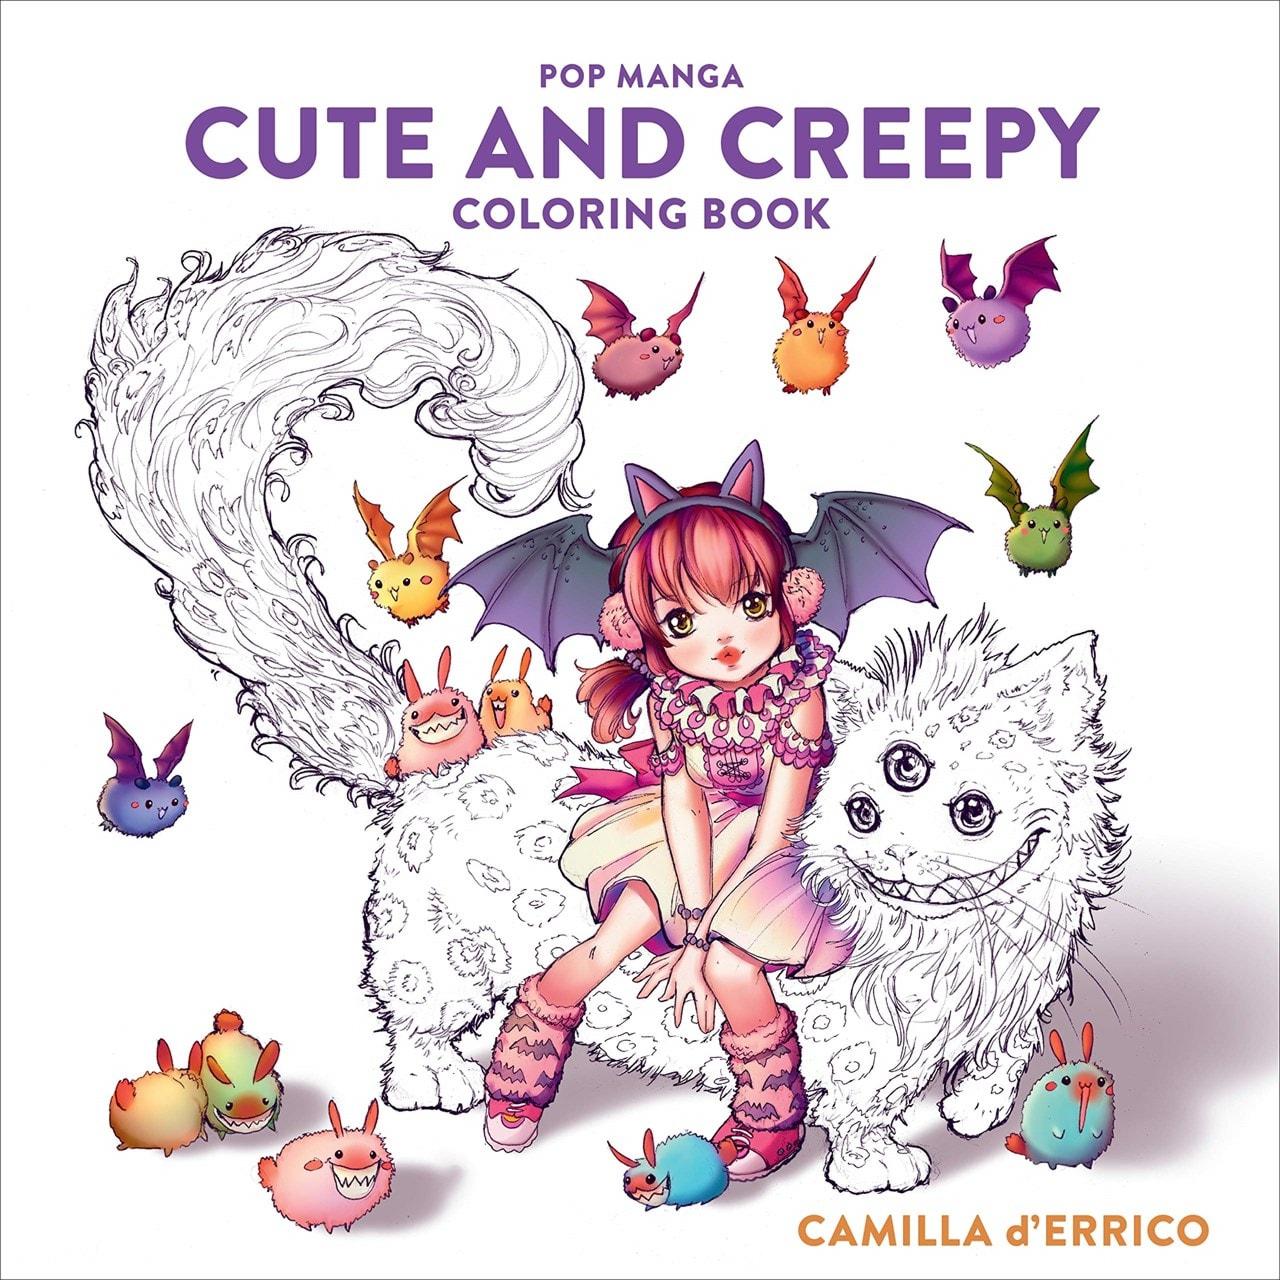 Pop Manga: Cute and Creepy Colouring Book - 1